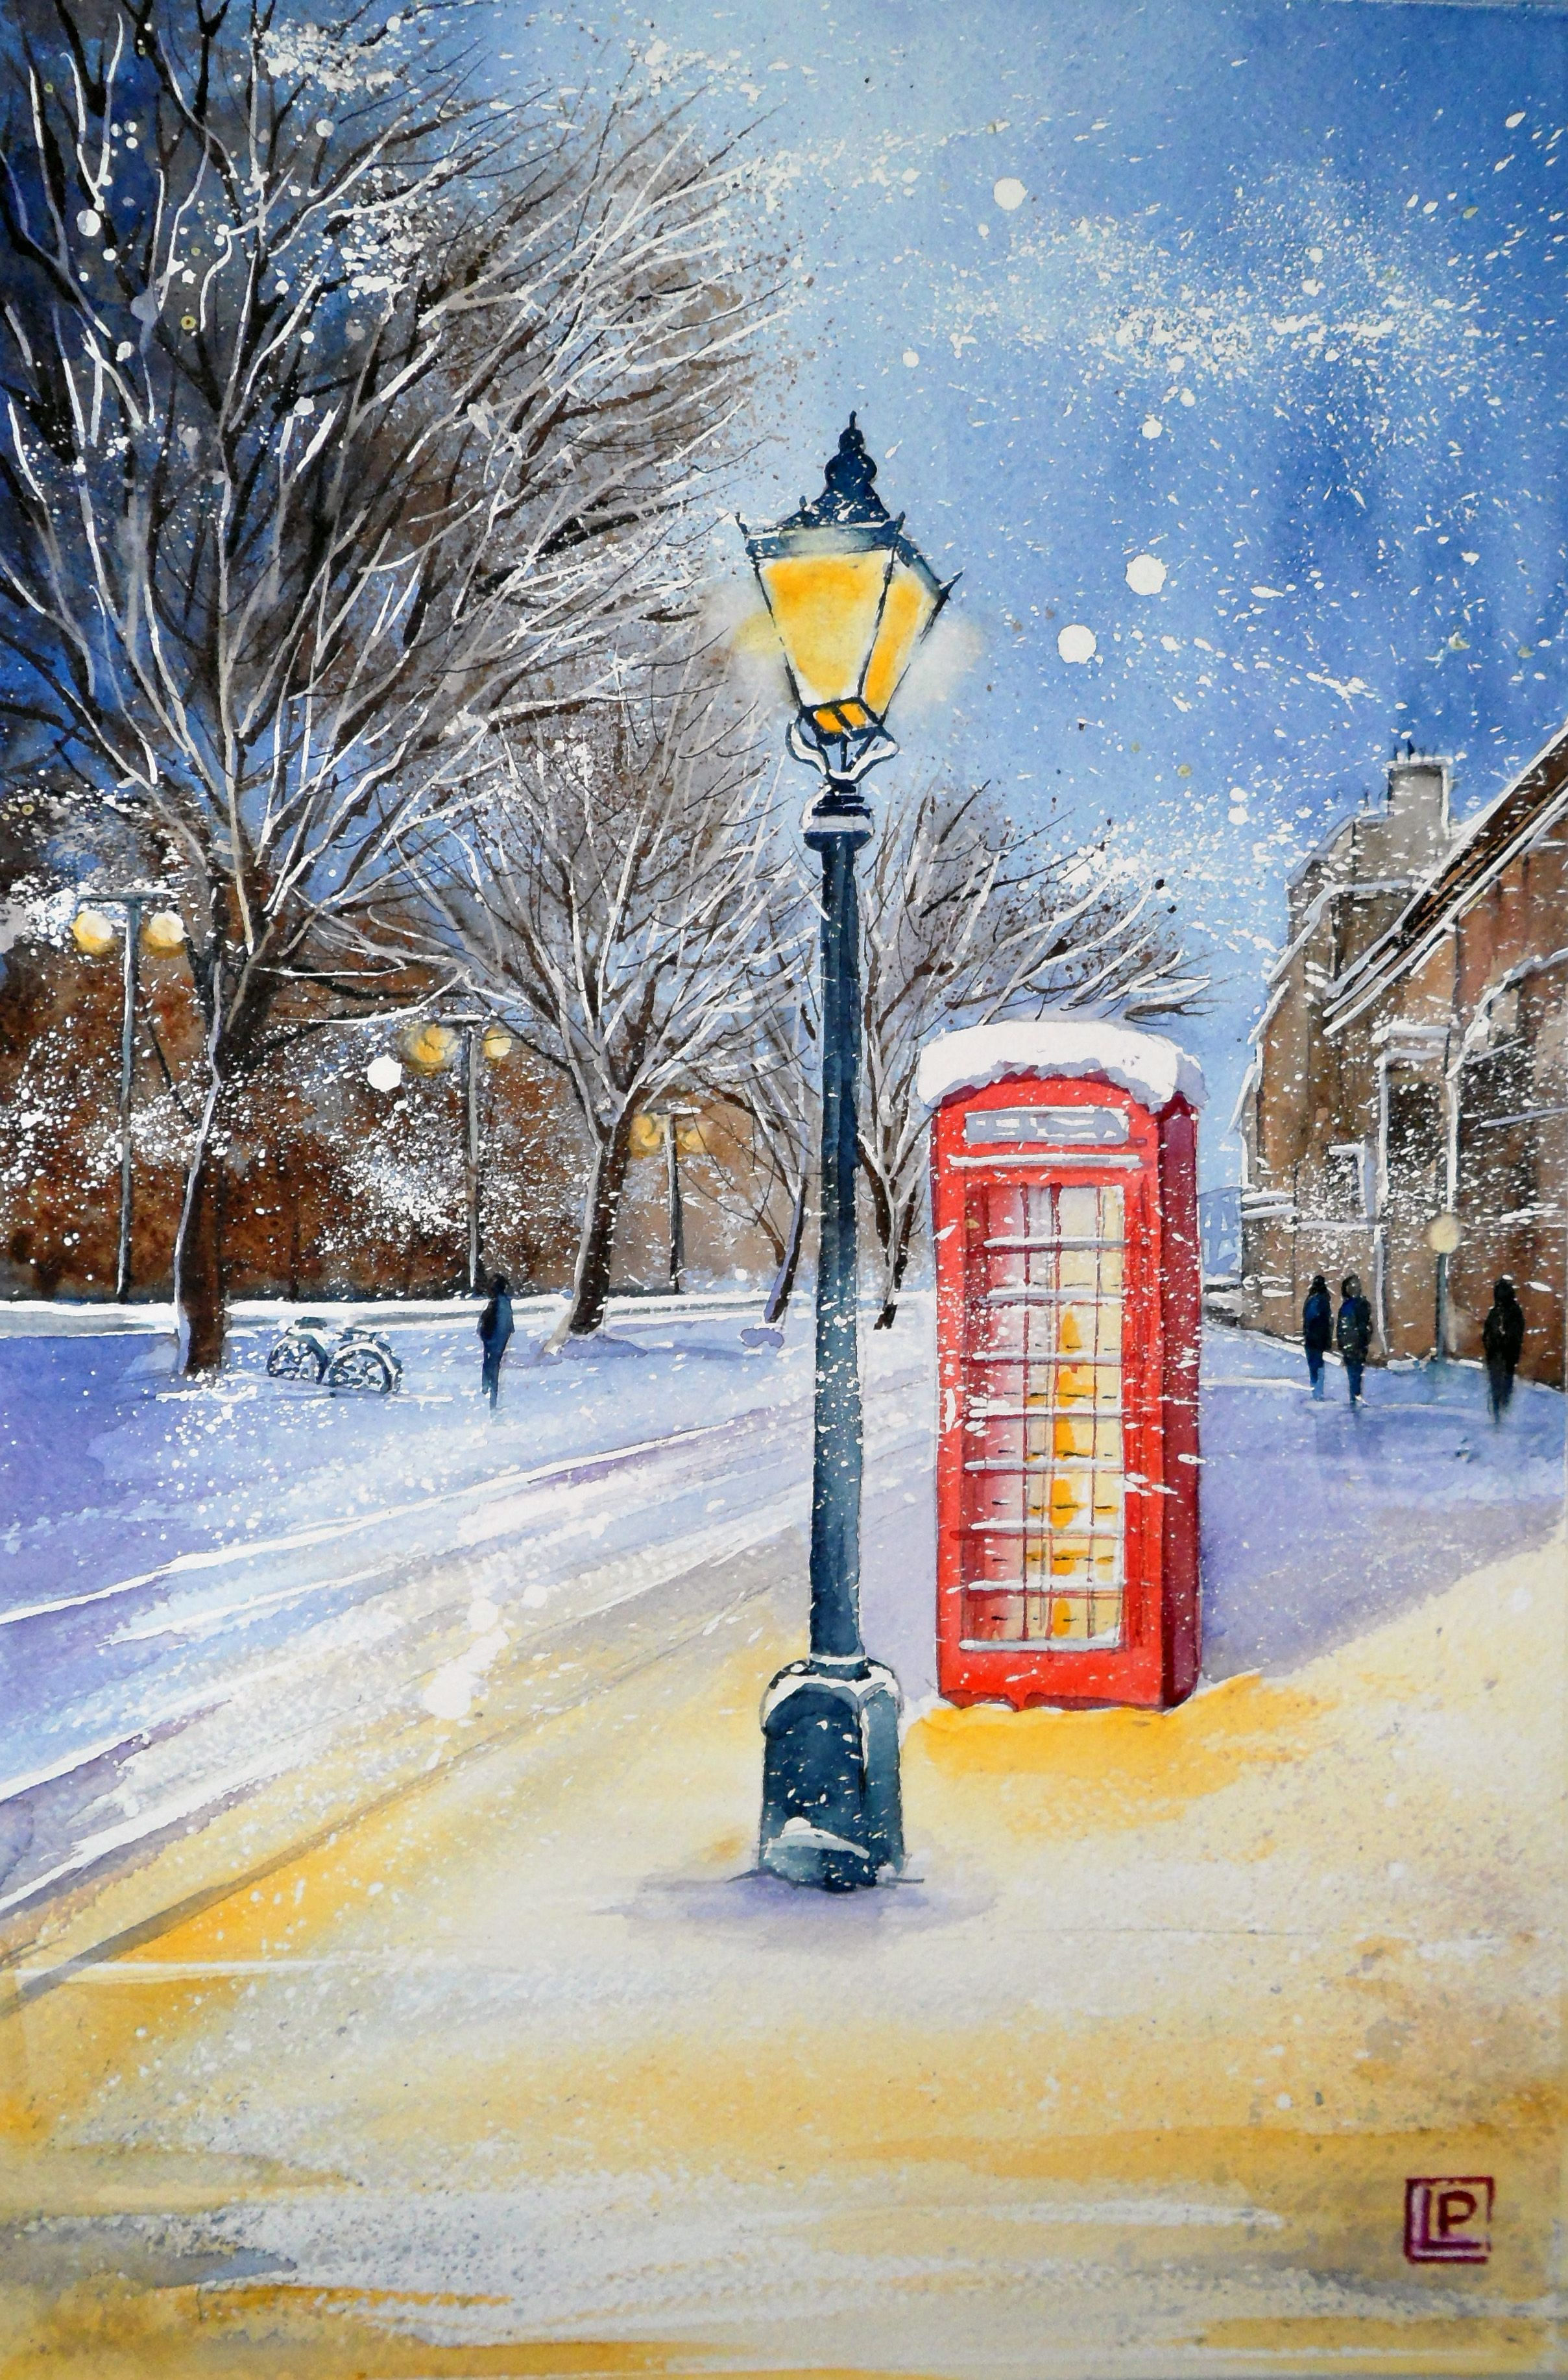 """London "" acquerello di Lorenza Pasquali Paintings 35x51 www.lorenzapasquali.it  Copyright © Lorenza Pasquali"